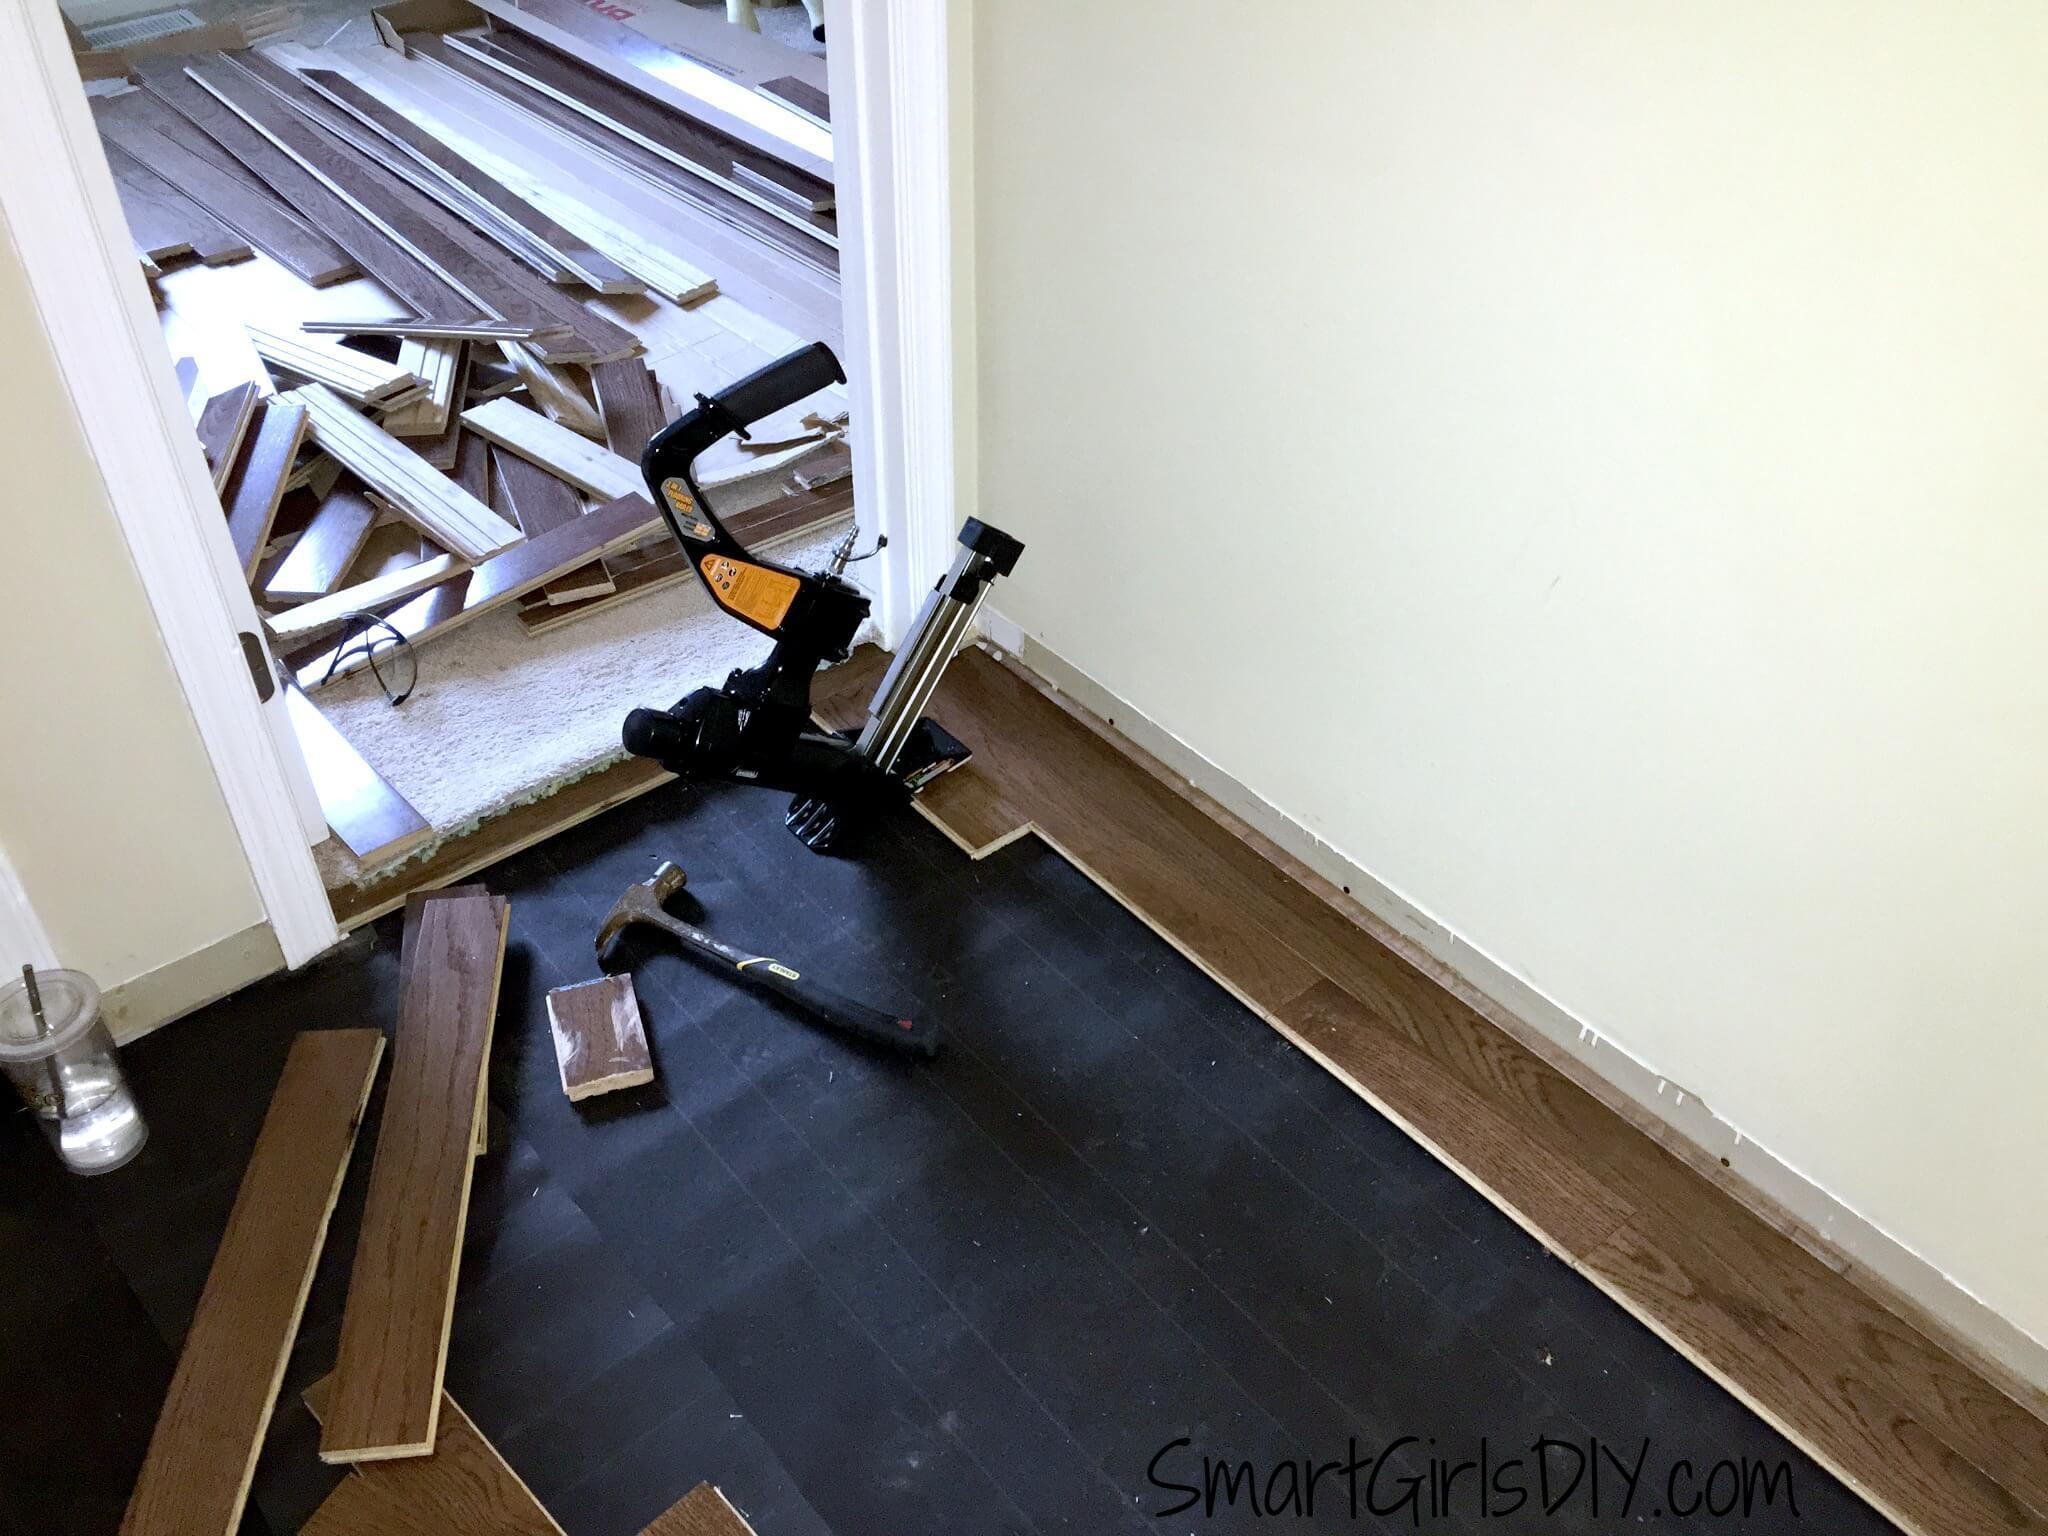 roofing felt hardwood floor underlayment of upstairs hallway 1 installing hardwood floors inside third row of hardwood can now use the floor nailer